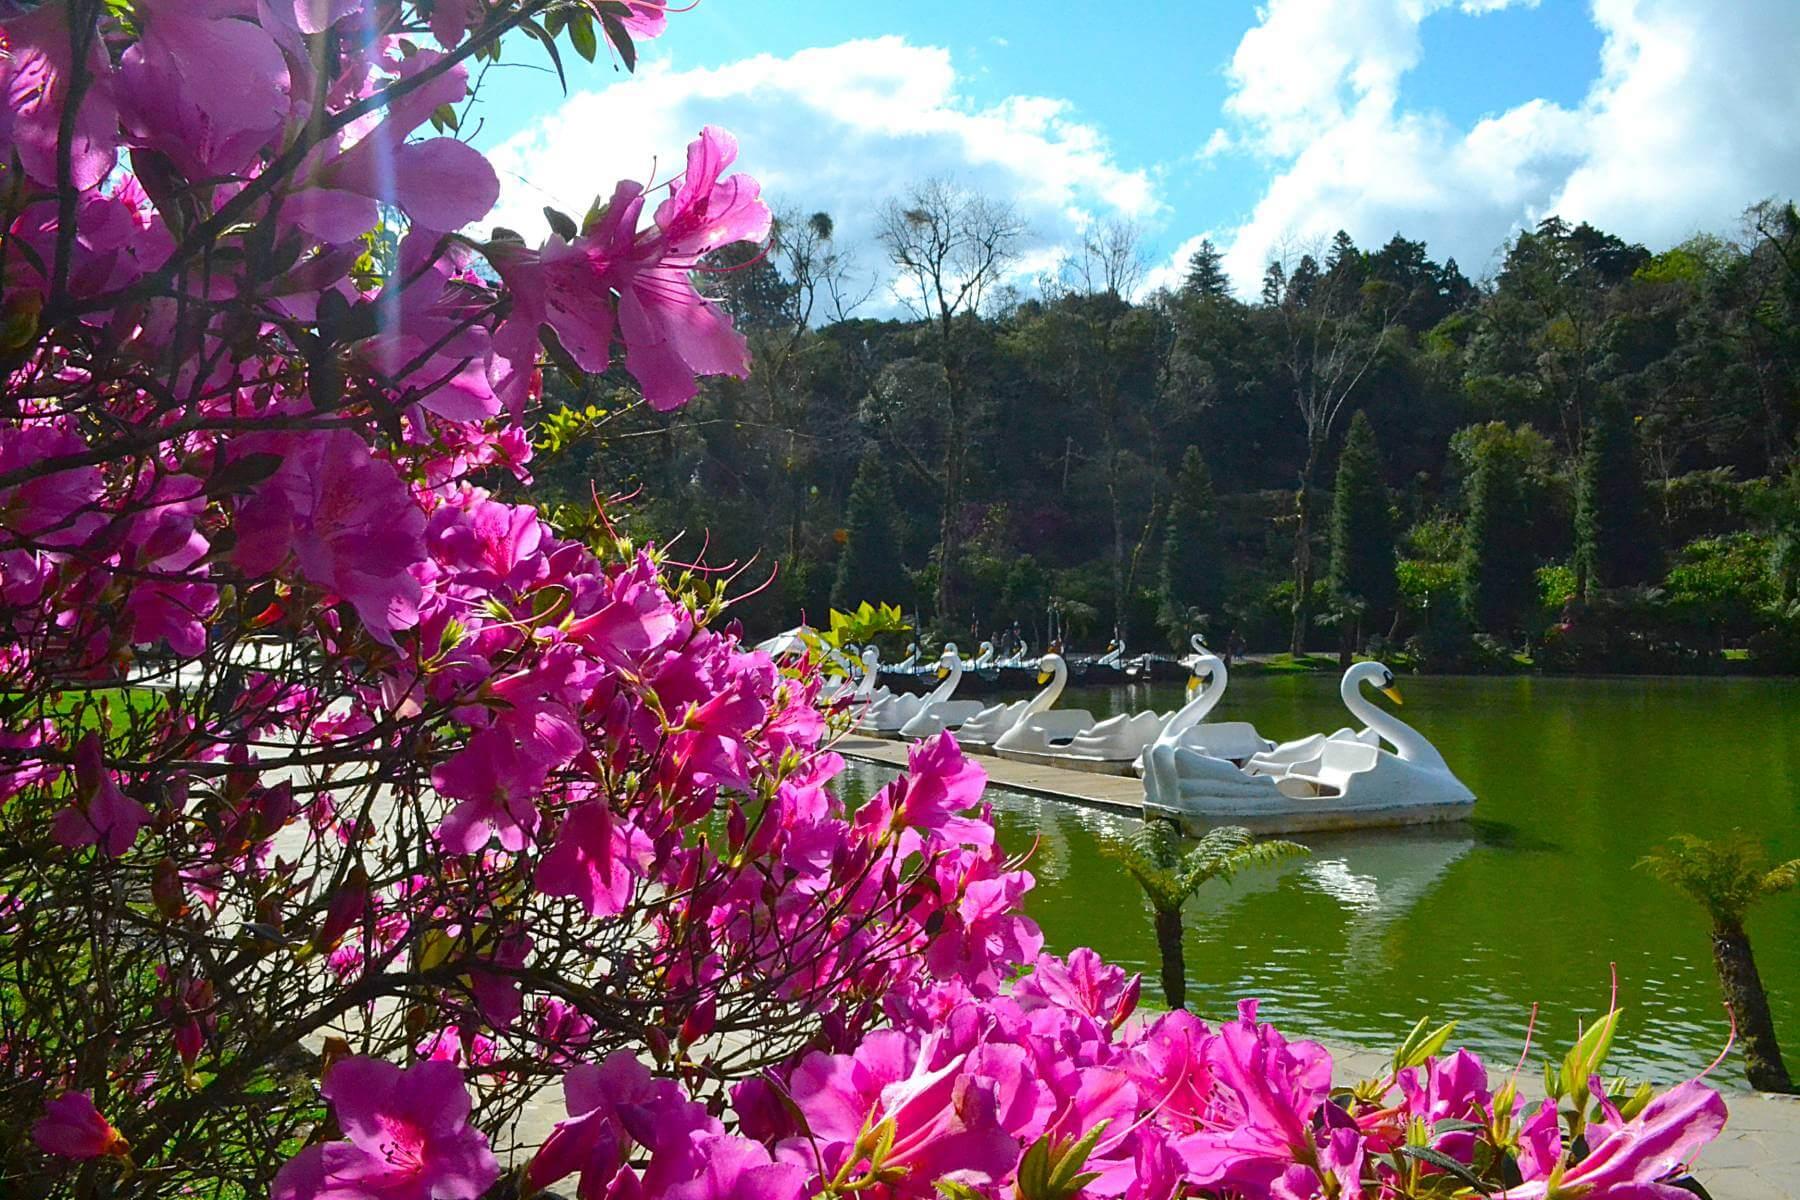 Lago Negro - Gramado #CurtaSuaFamilia #HotelSustentavel #TurismoVerde #TravelersChoice #EcoLider #Gramado